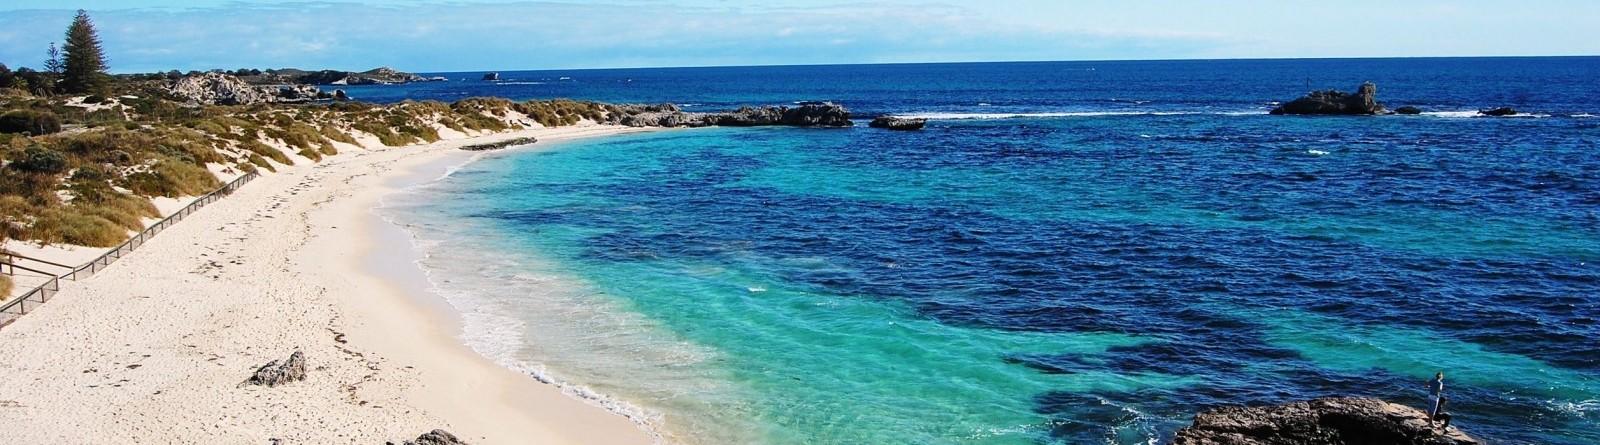 Beautiful beach on rottnest island off the coast of perth australia 1600x1063